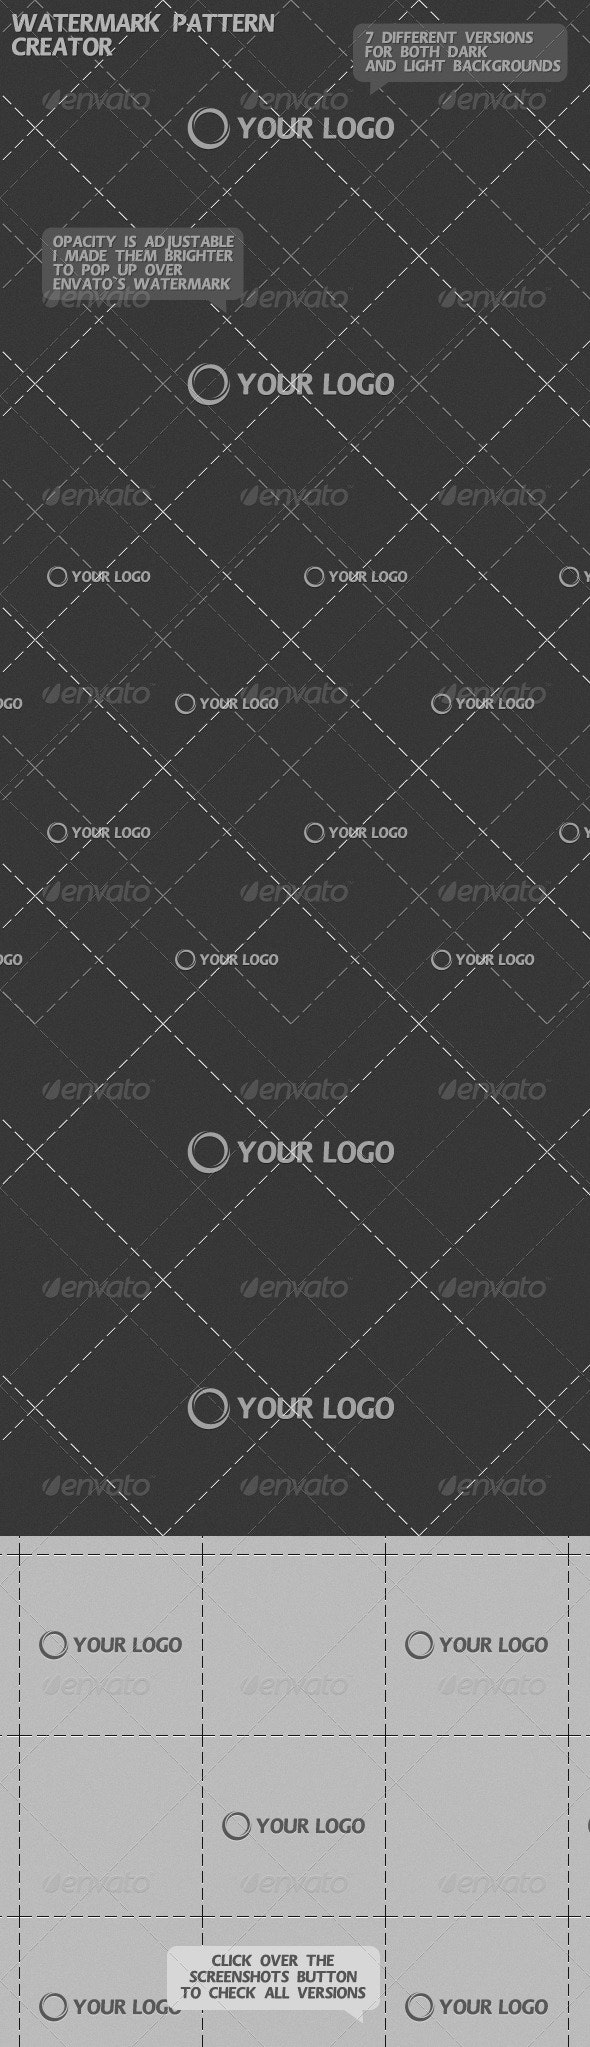 Watermark Pattern Creator - Patterns Backgrounds